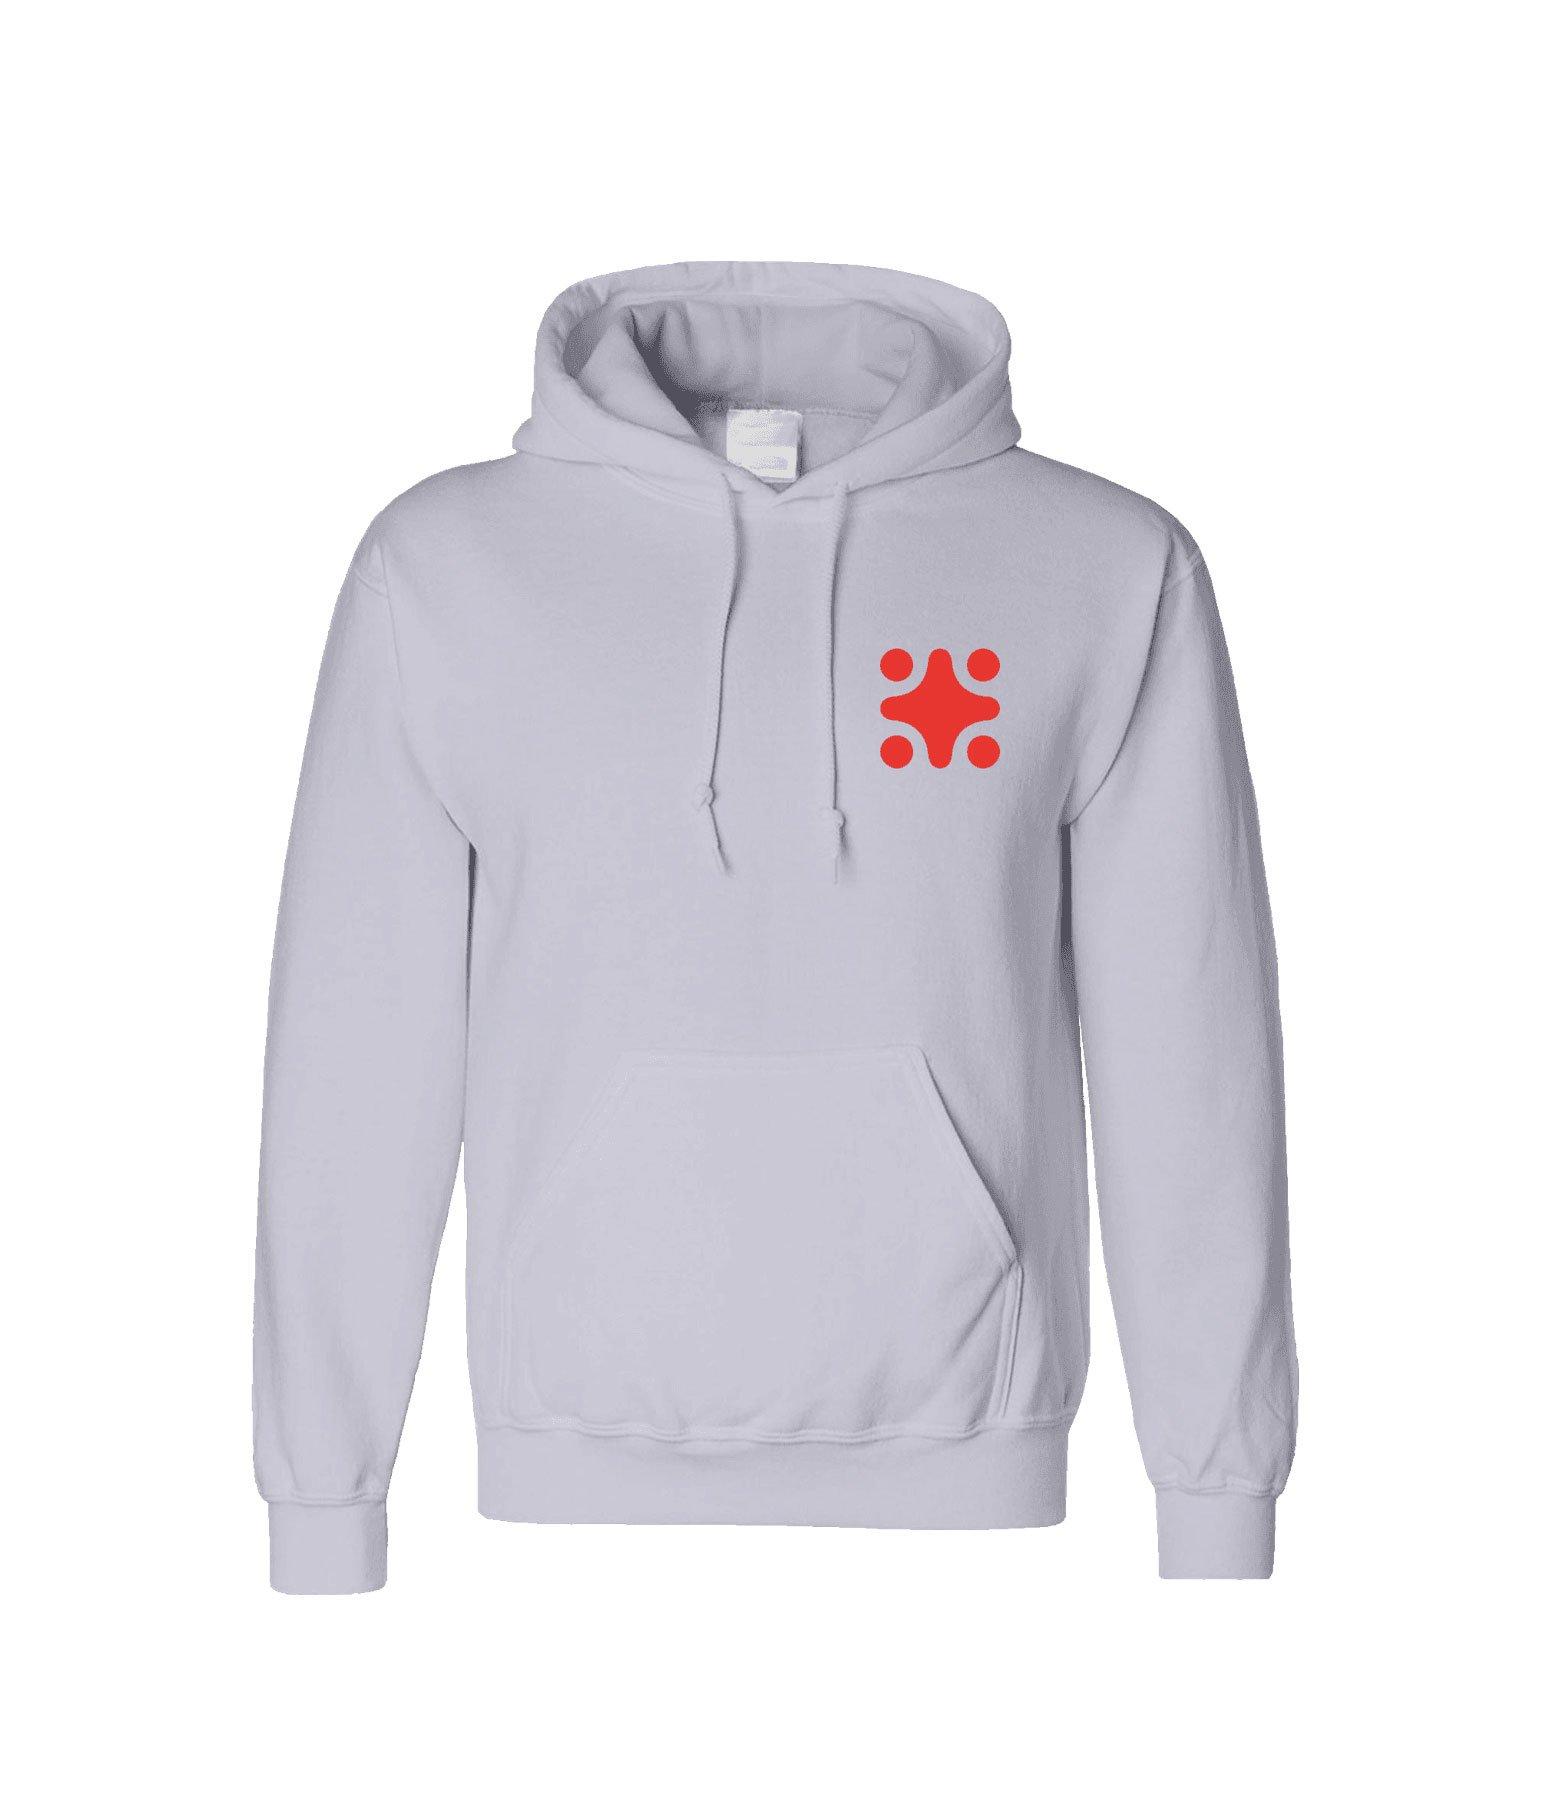 product-white-hoody